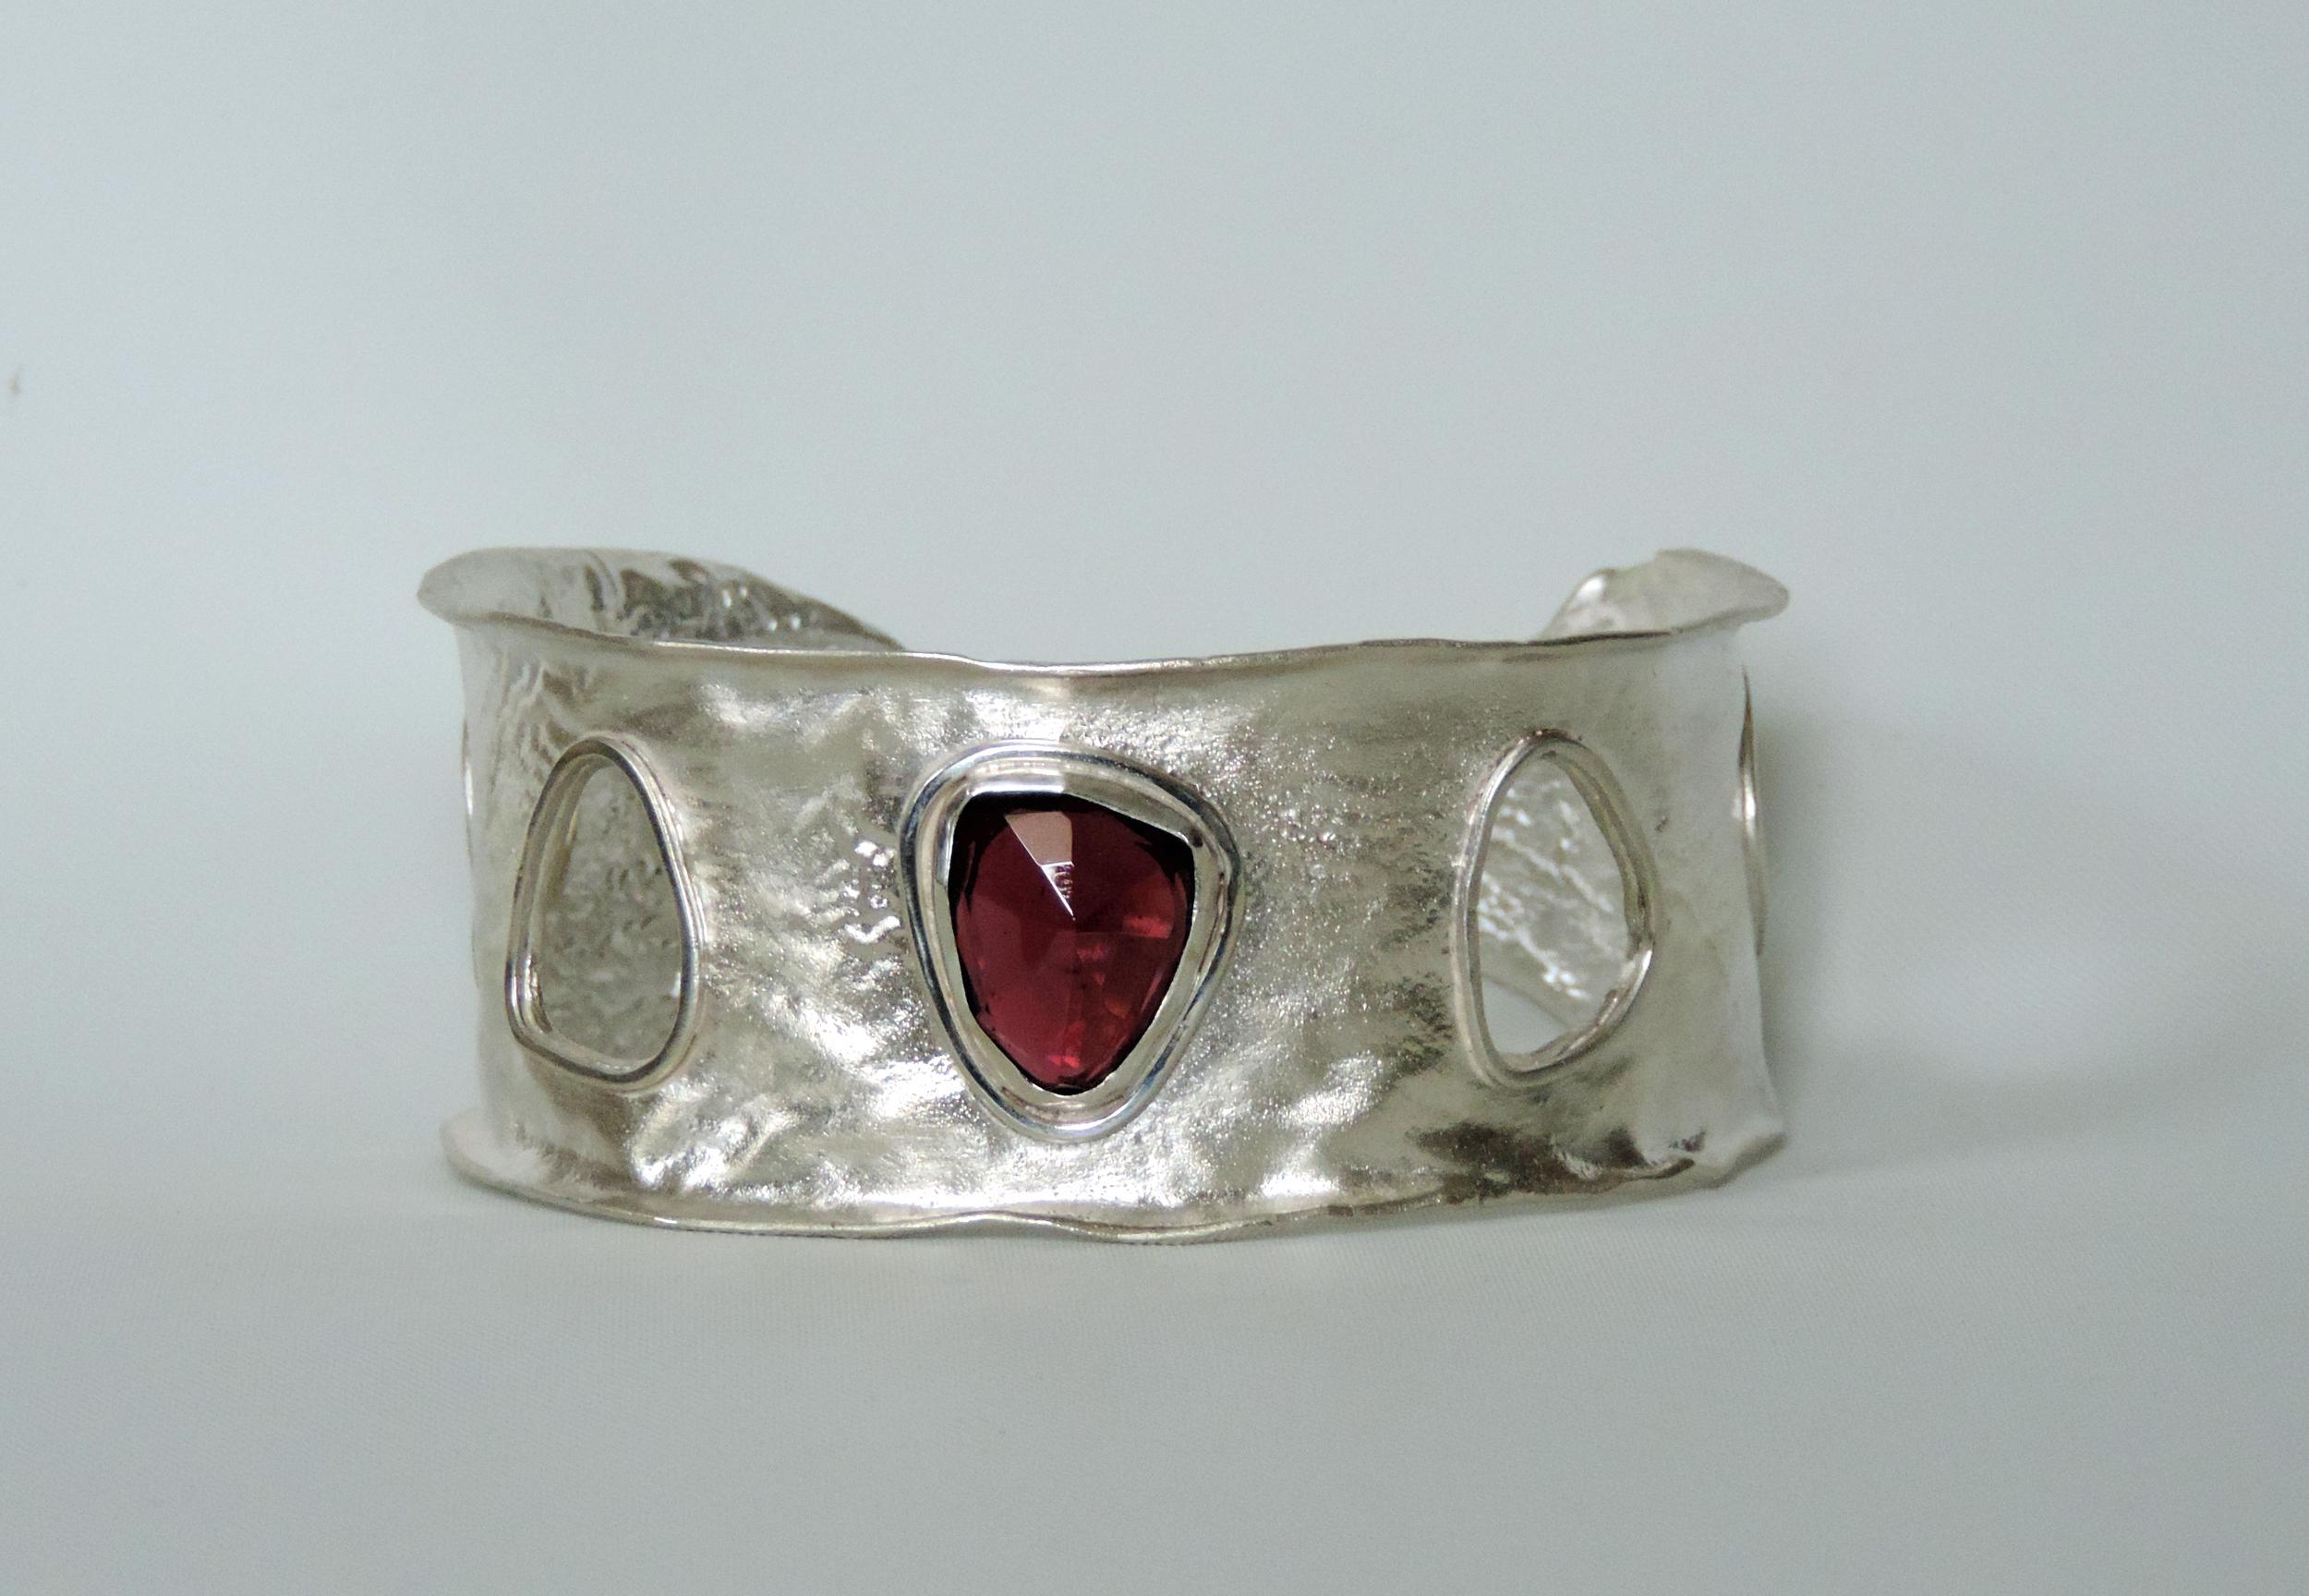 Christine Peters Reticulated Silver Cuff with Rhodolite Garnet